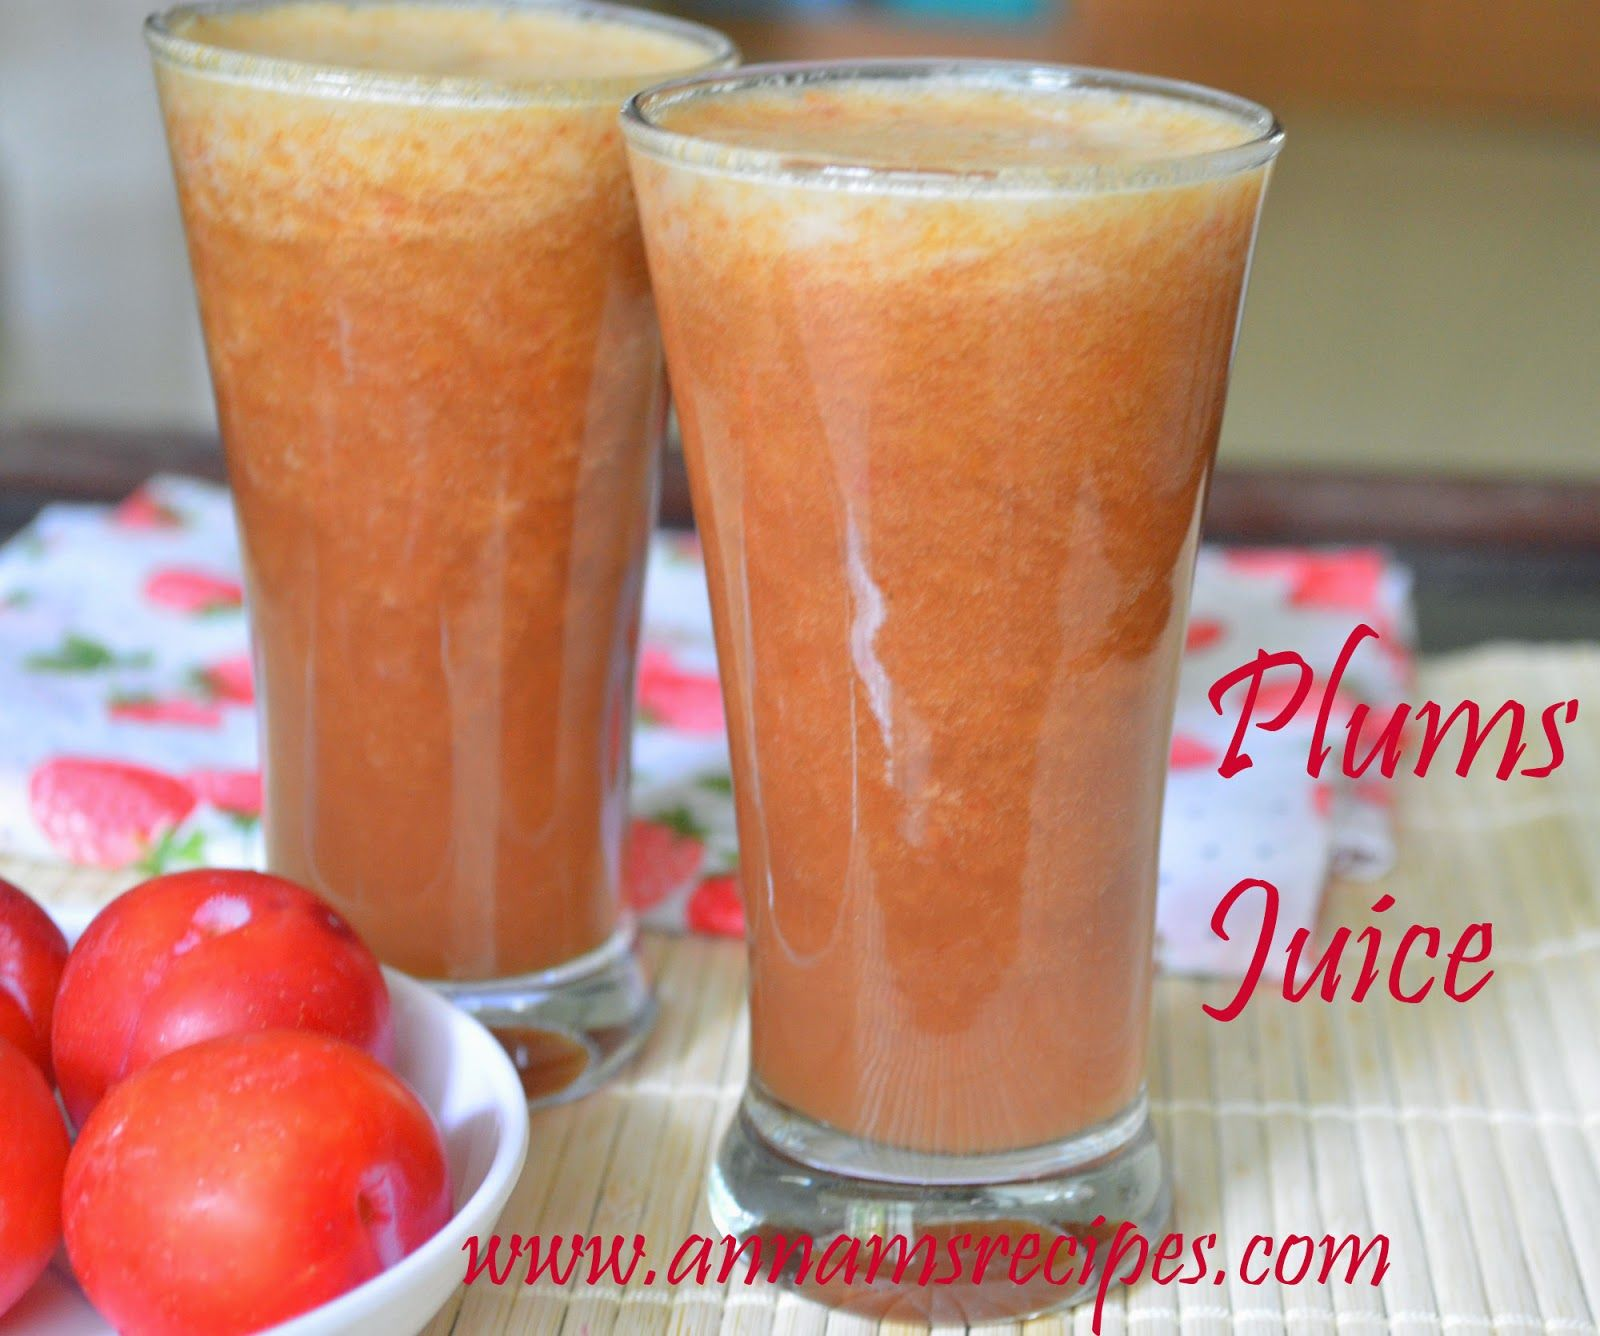 Annam's Recipes Plums Juice Plum juice, Juicing recipes